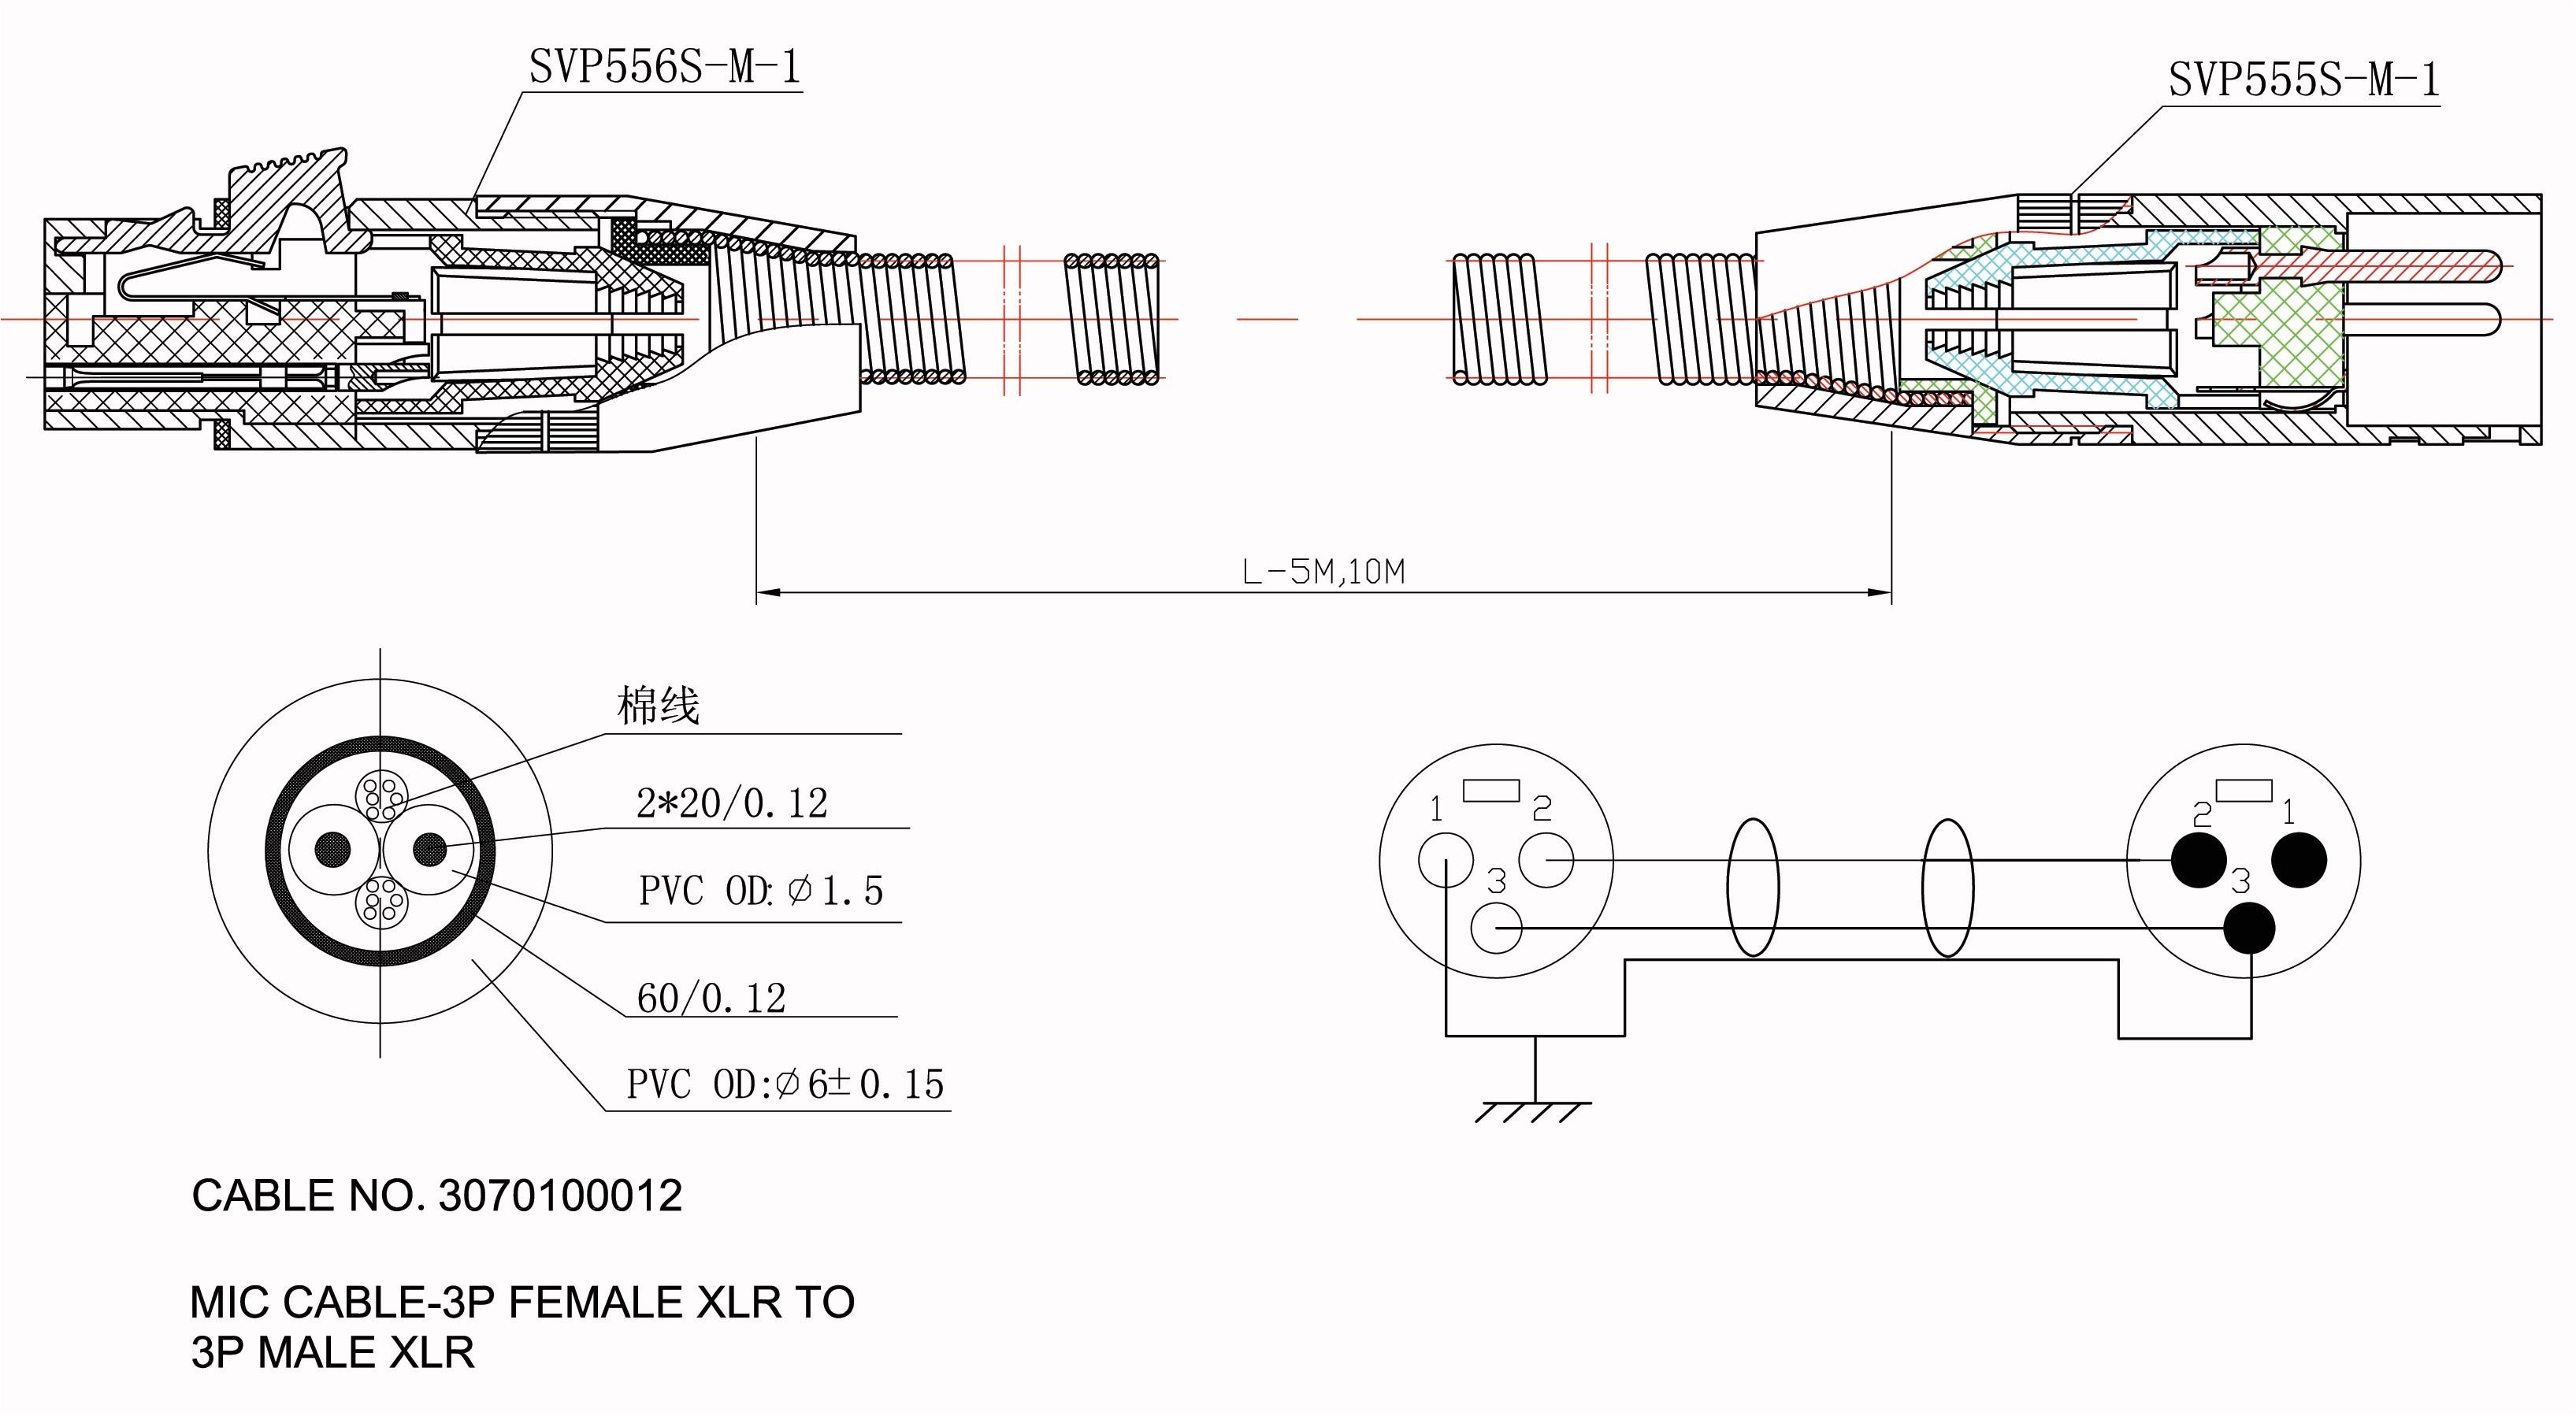 bell transformer wiring diagram new 480v to 120v transformer wiring diagram new wiring diagram for